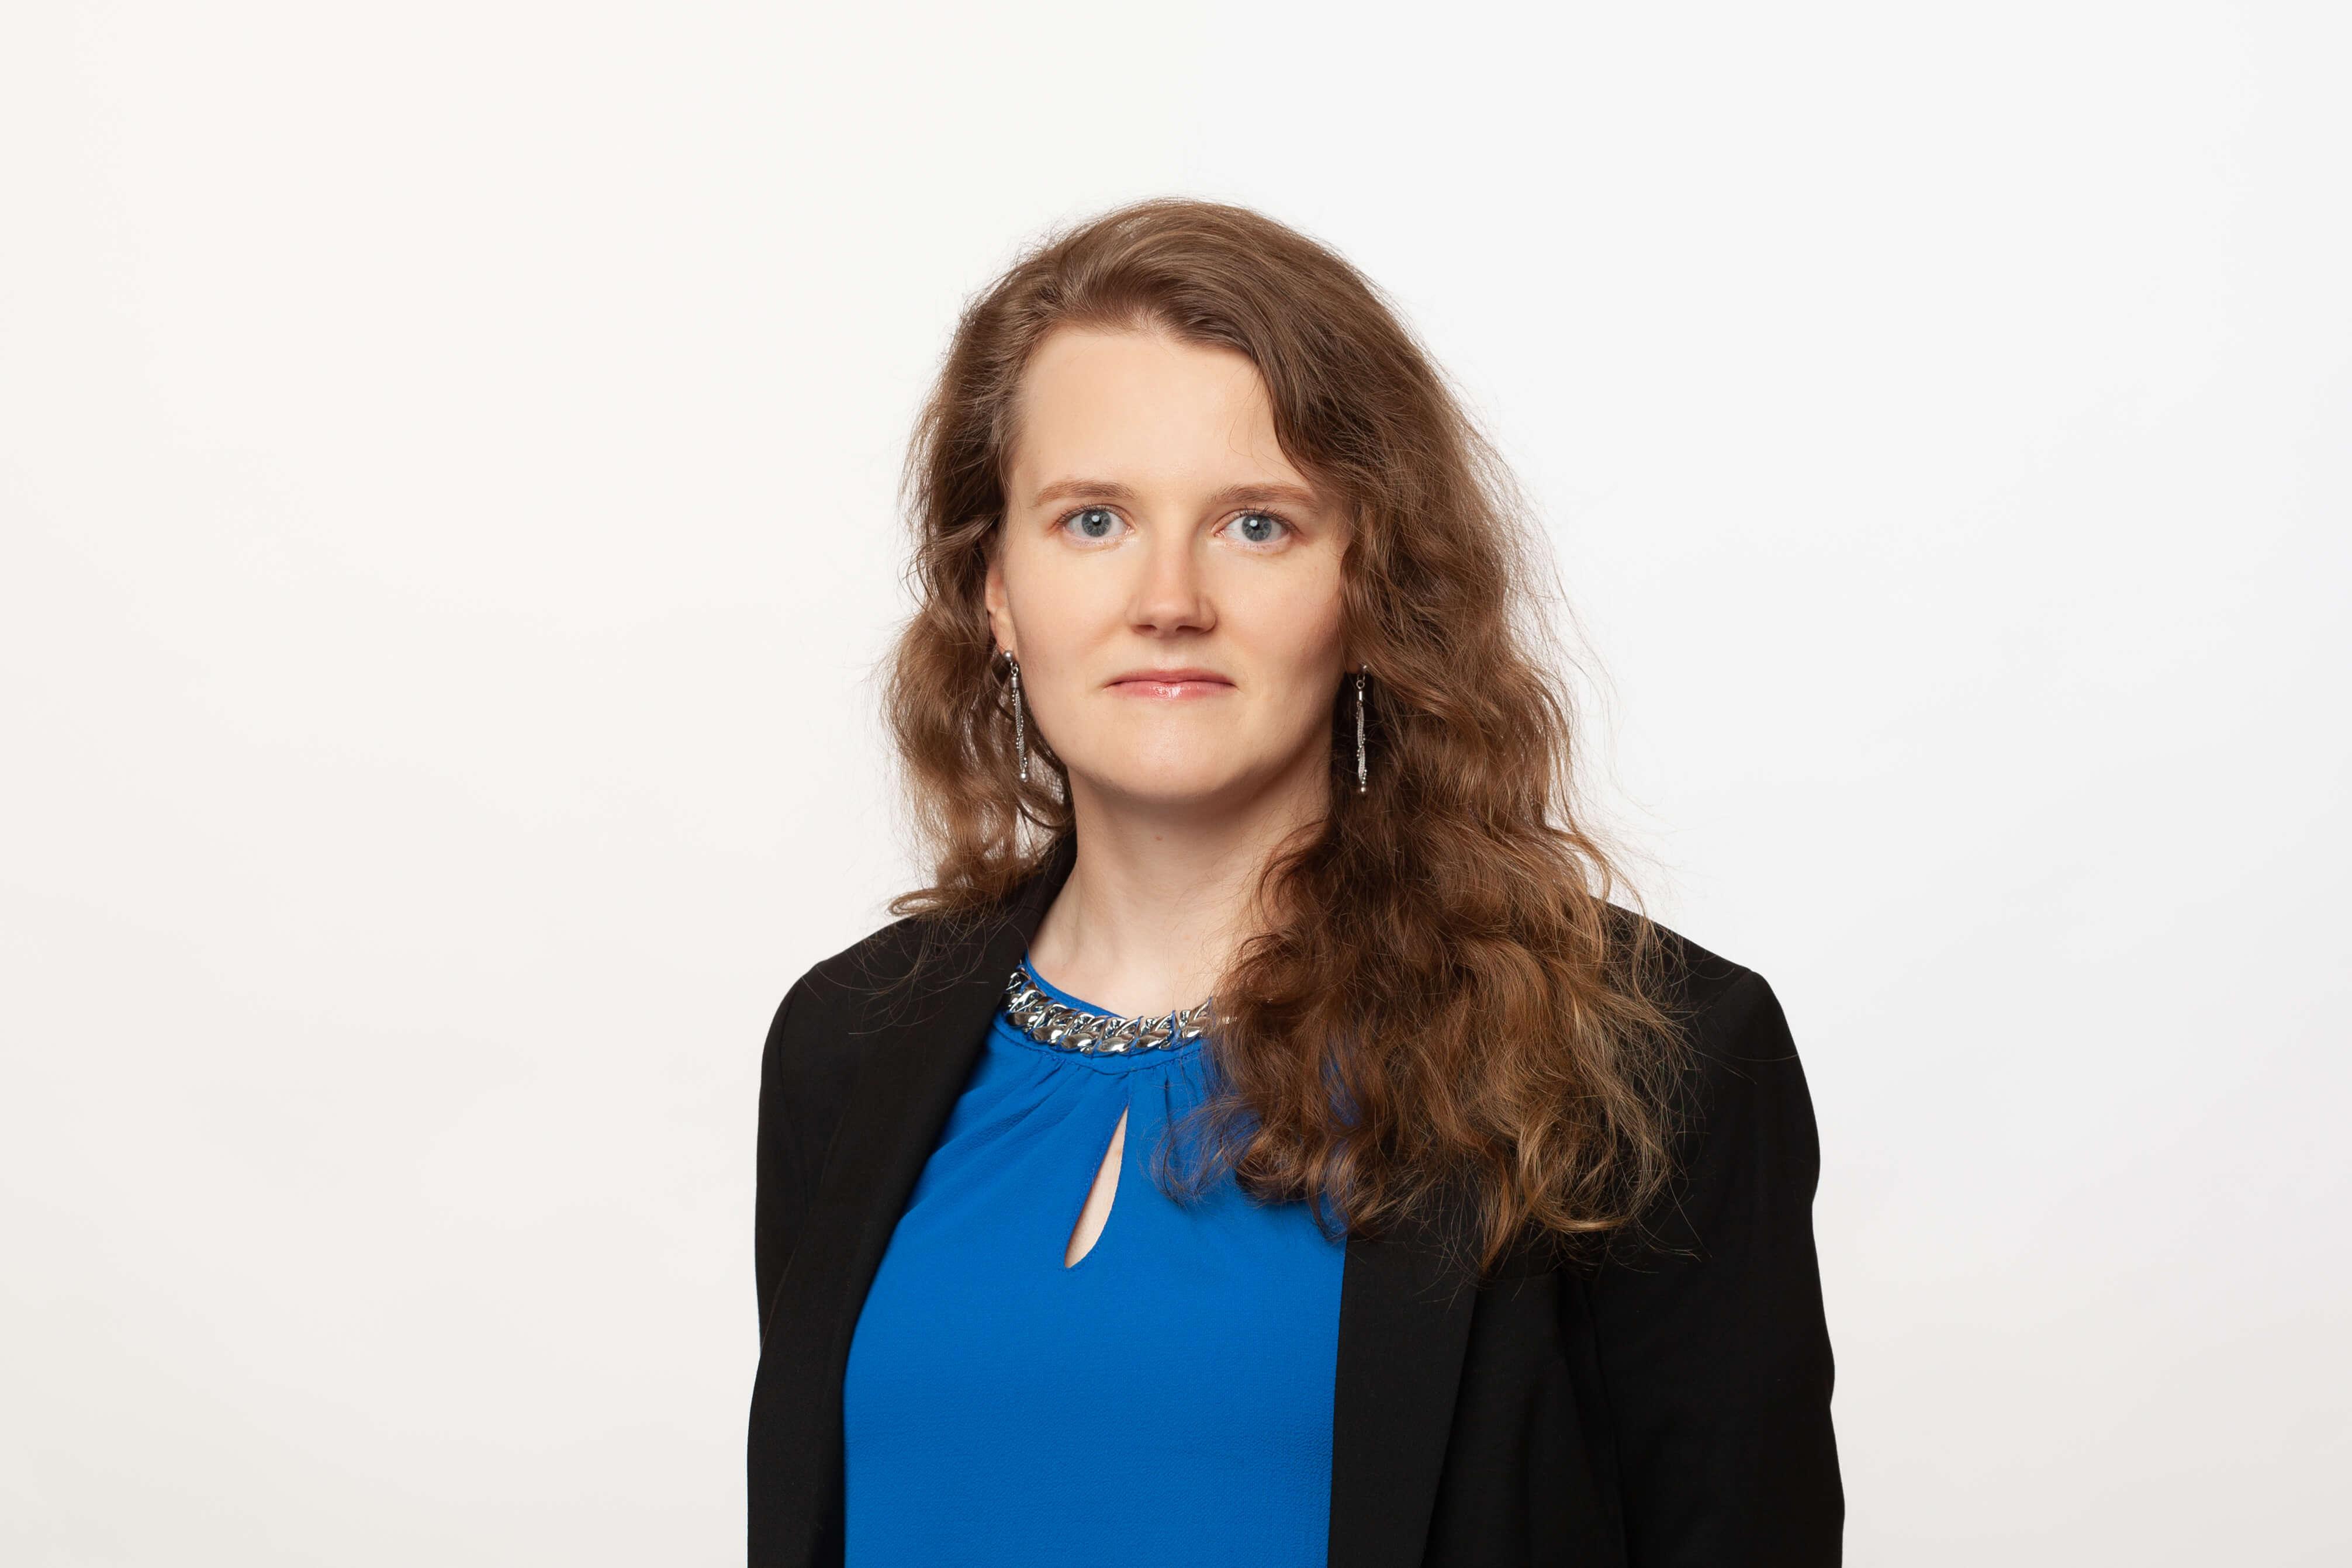 Lida Jakubowska